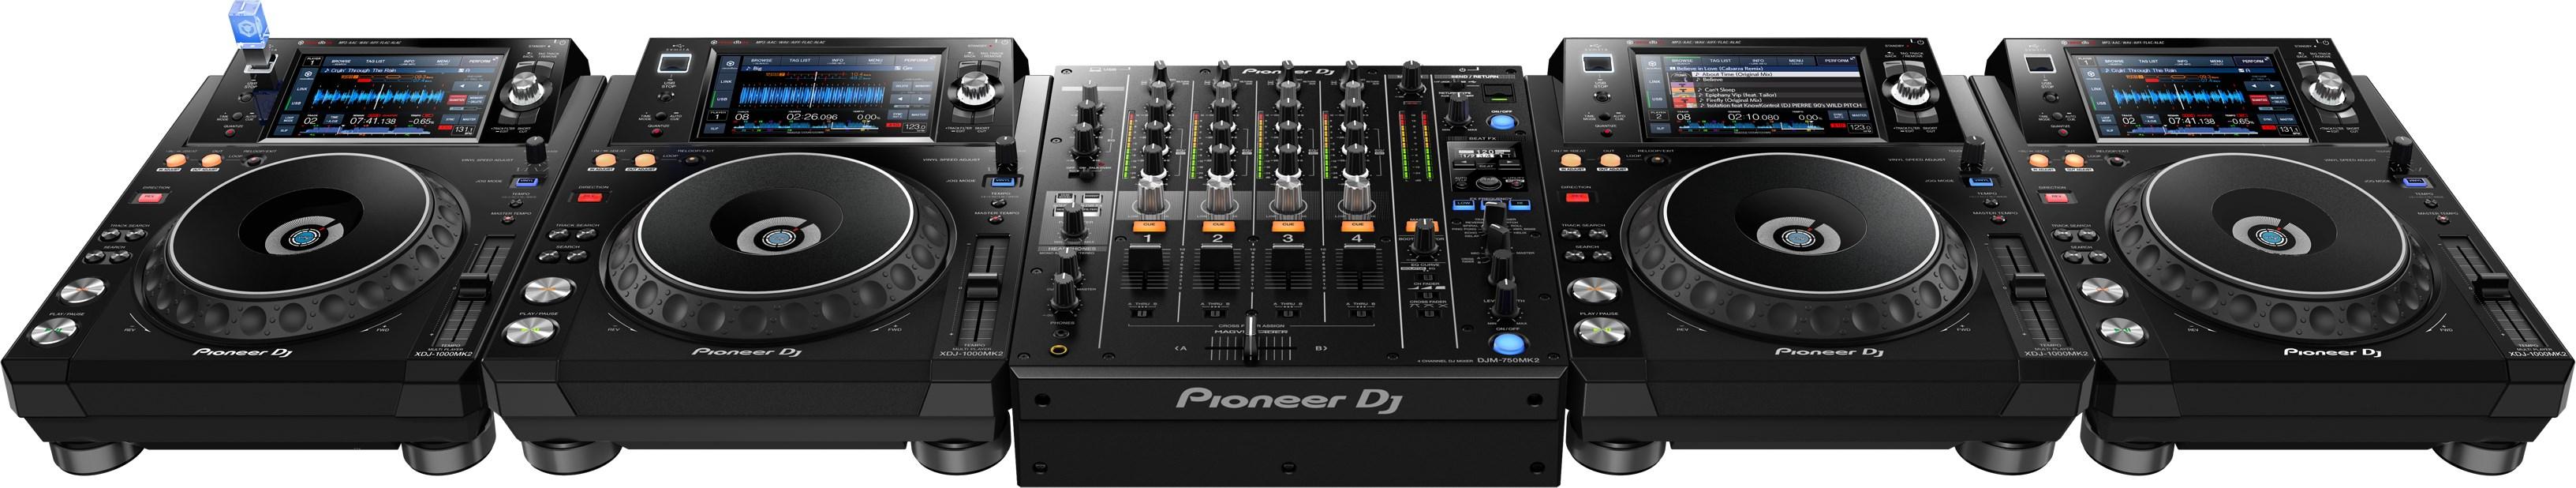 djm-750mk2-set-xdj-1000mk2-4-decks